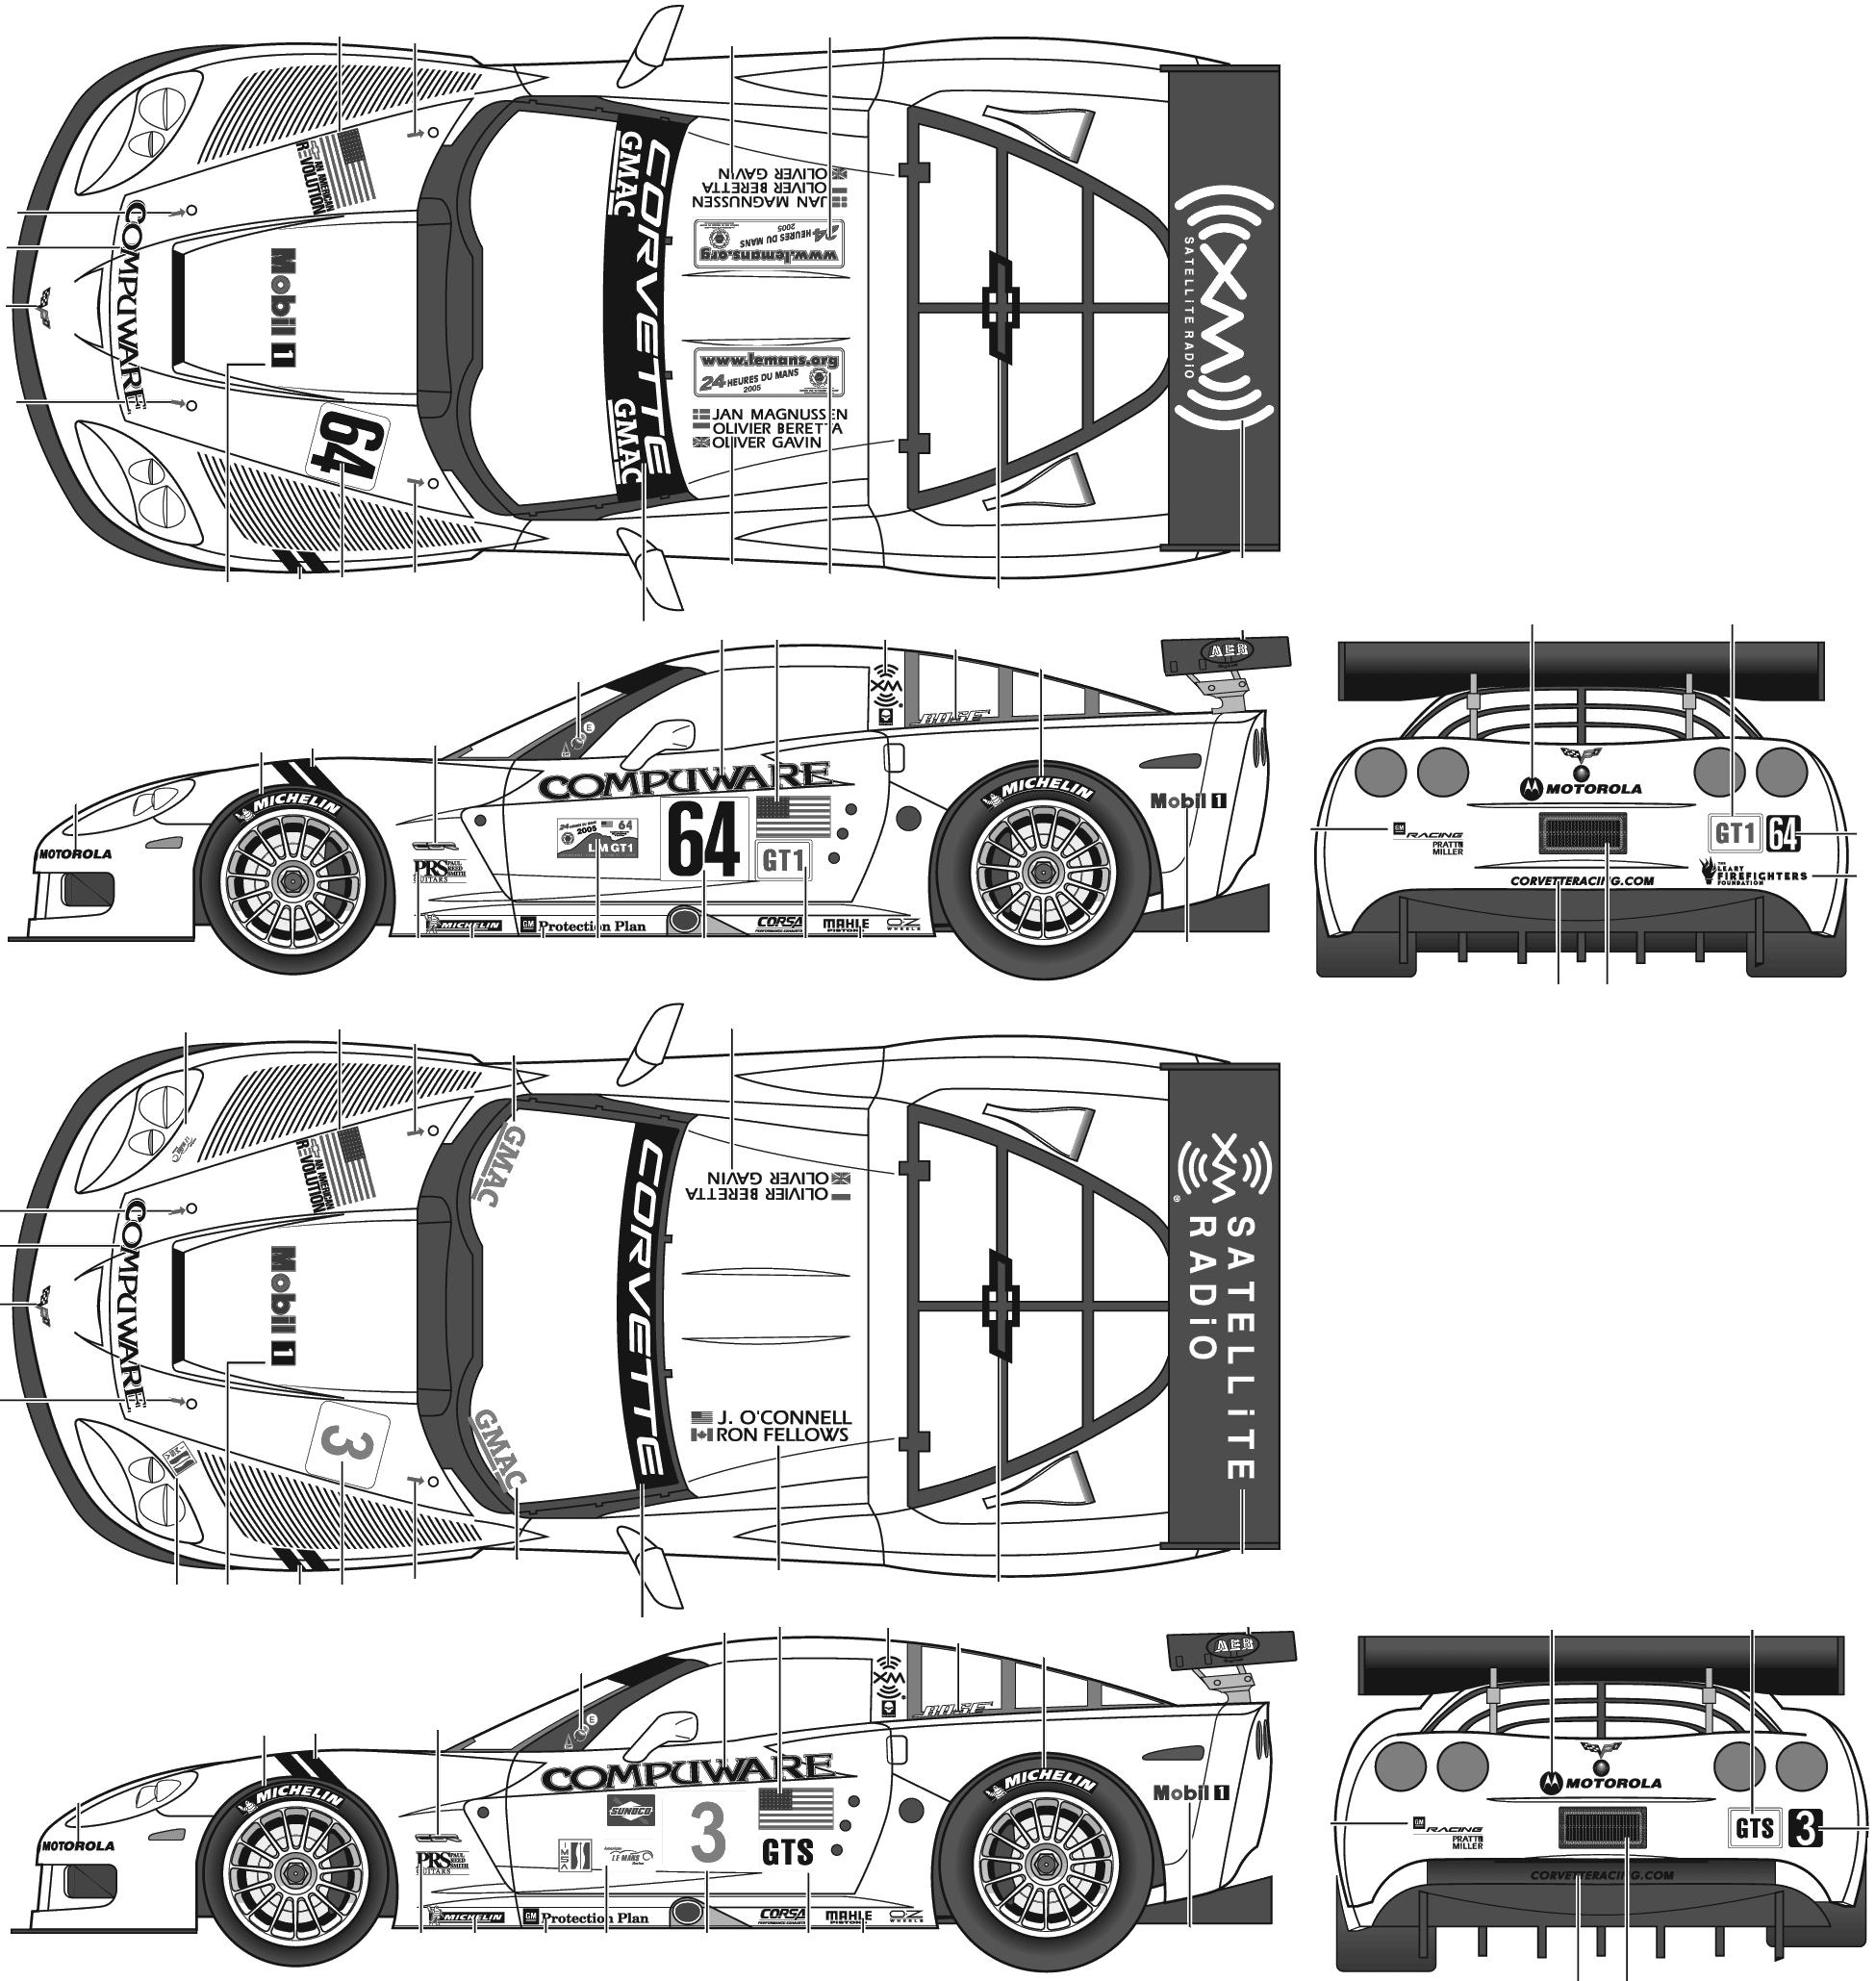 Corvette C6 R on Tesla Model 3 Dimensions